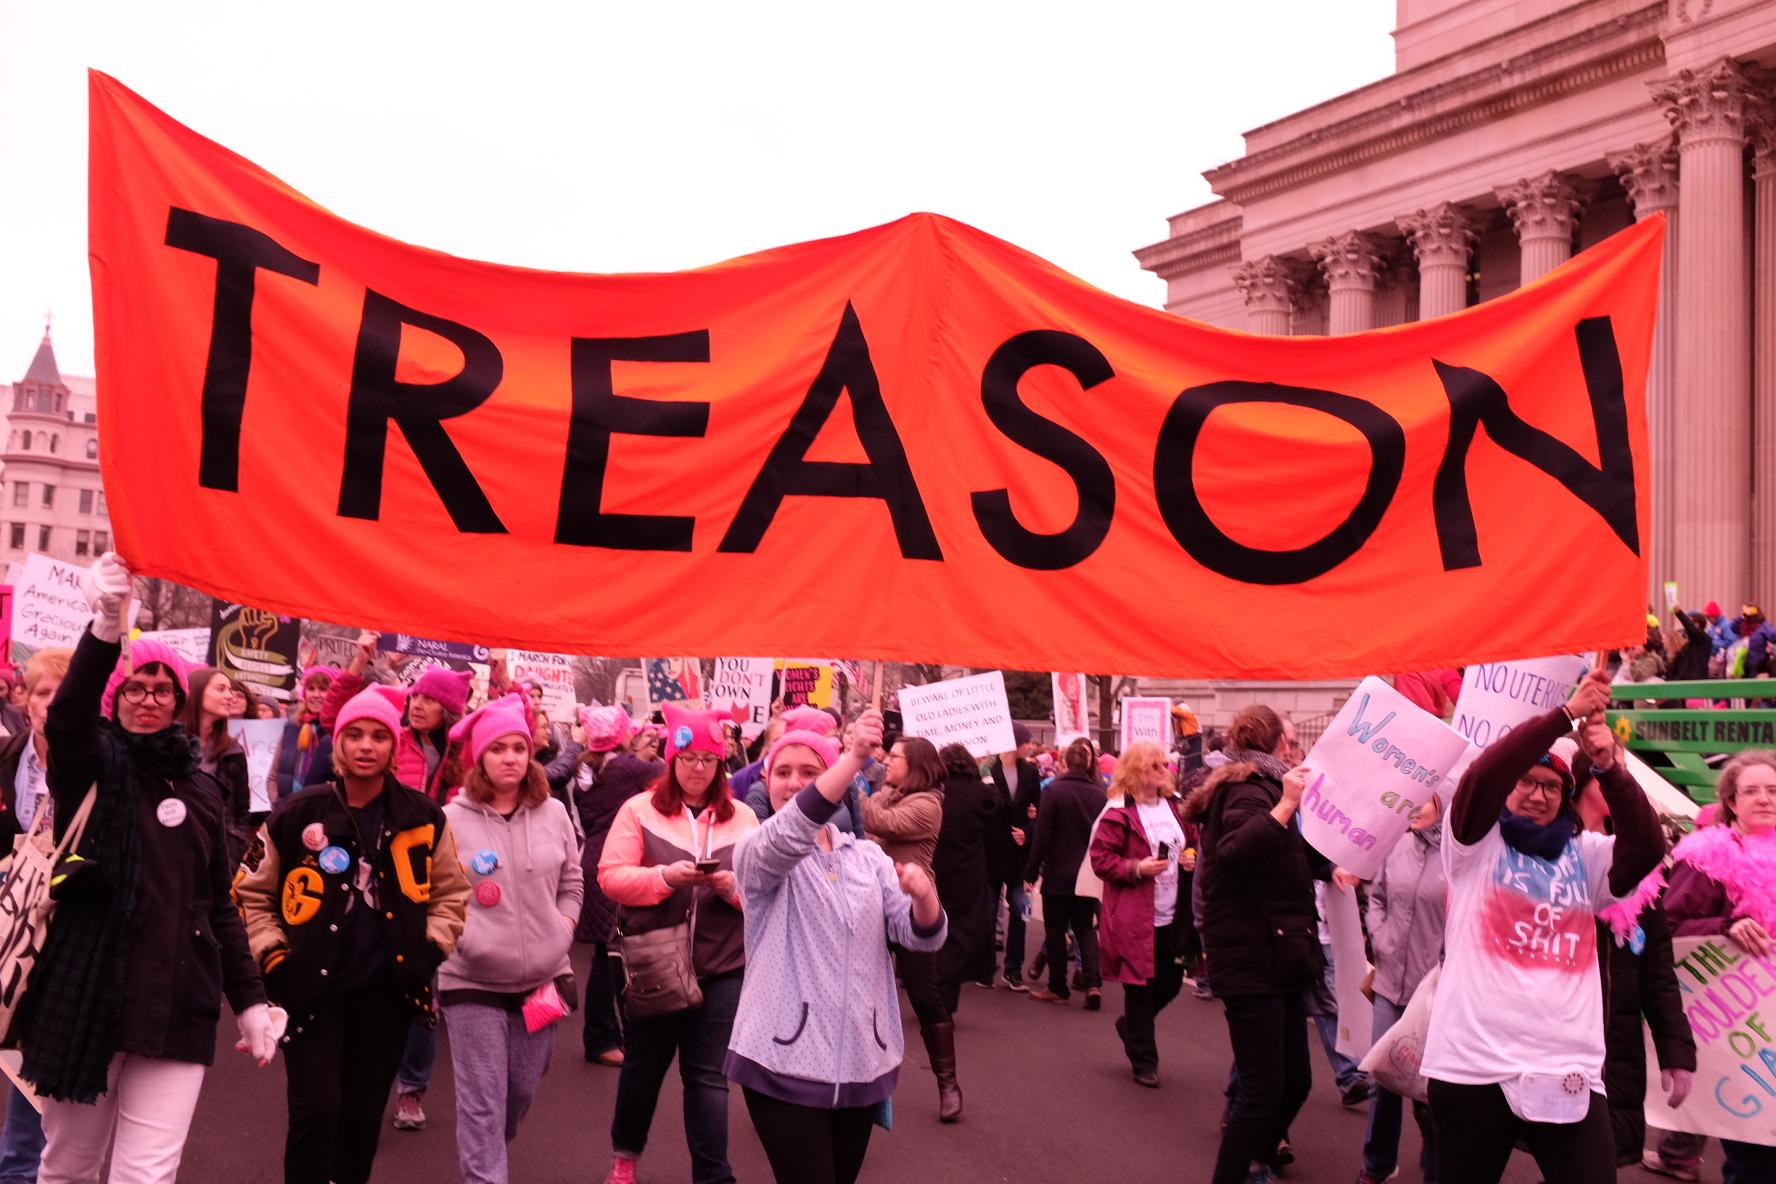 Sarah Ullman. The Women's March on Washington, January 21, 2017.